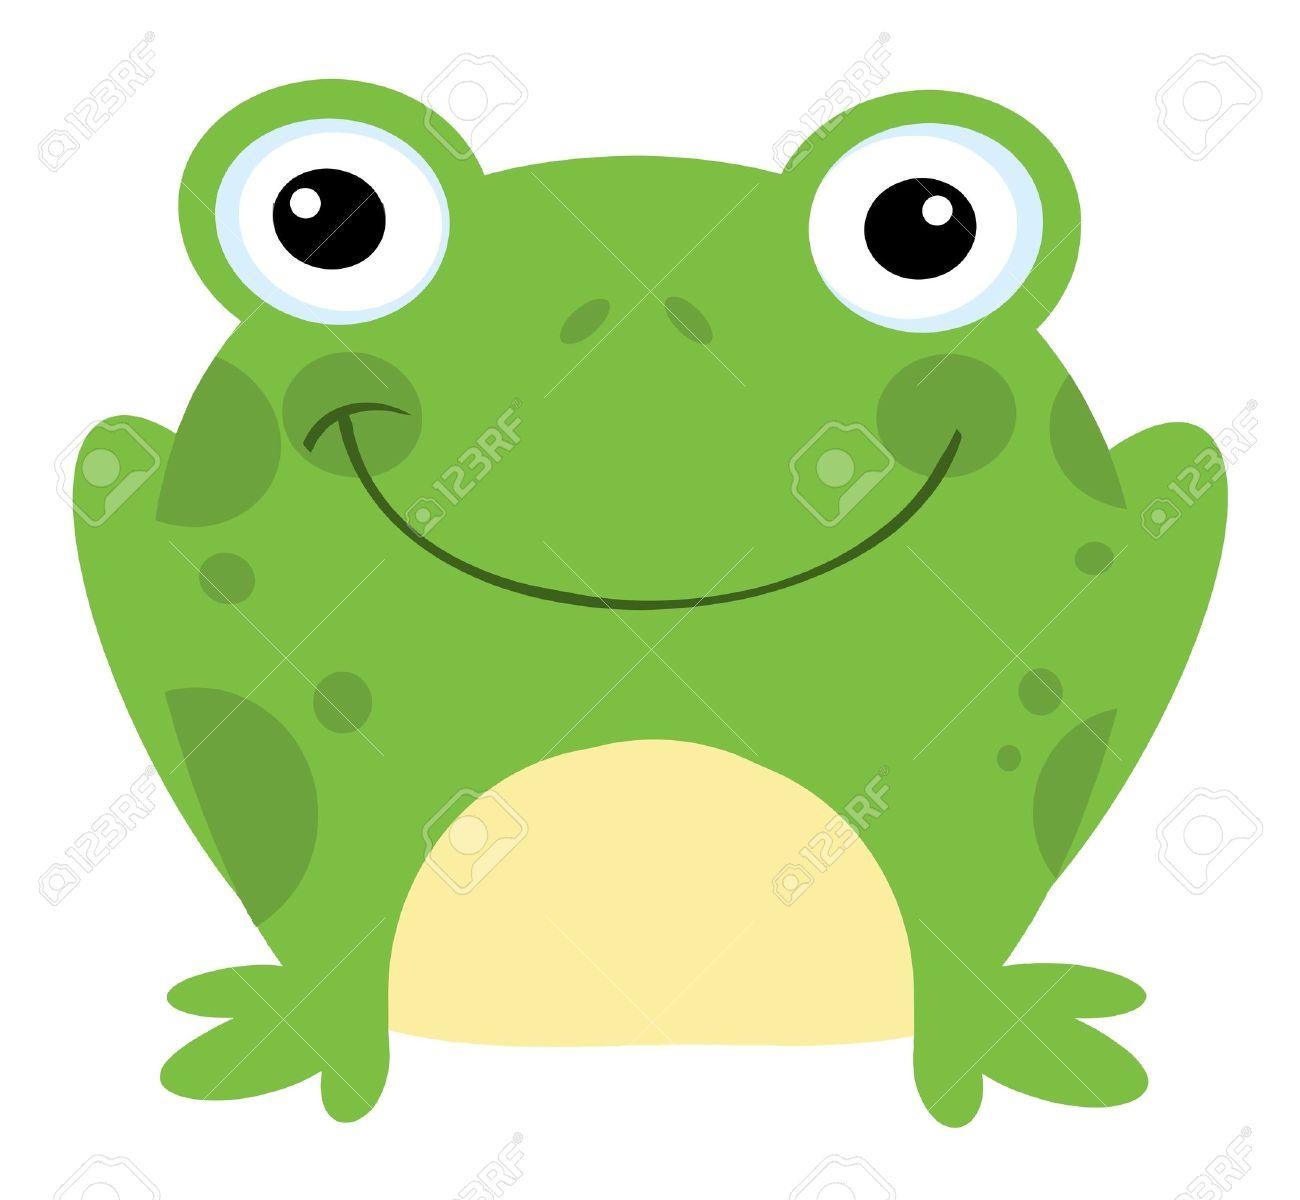 Head Frog Cartoon Character Stock Vector - 8930258